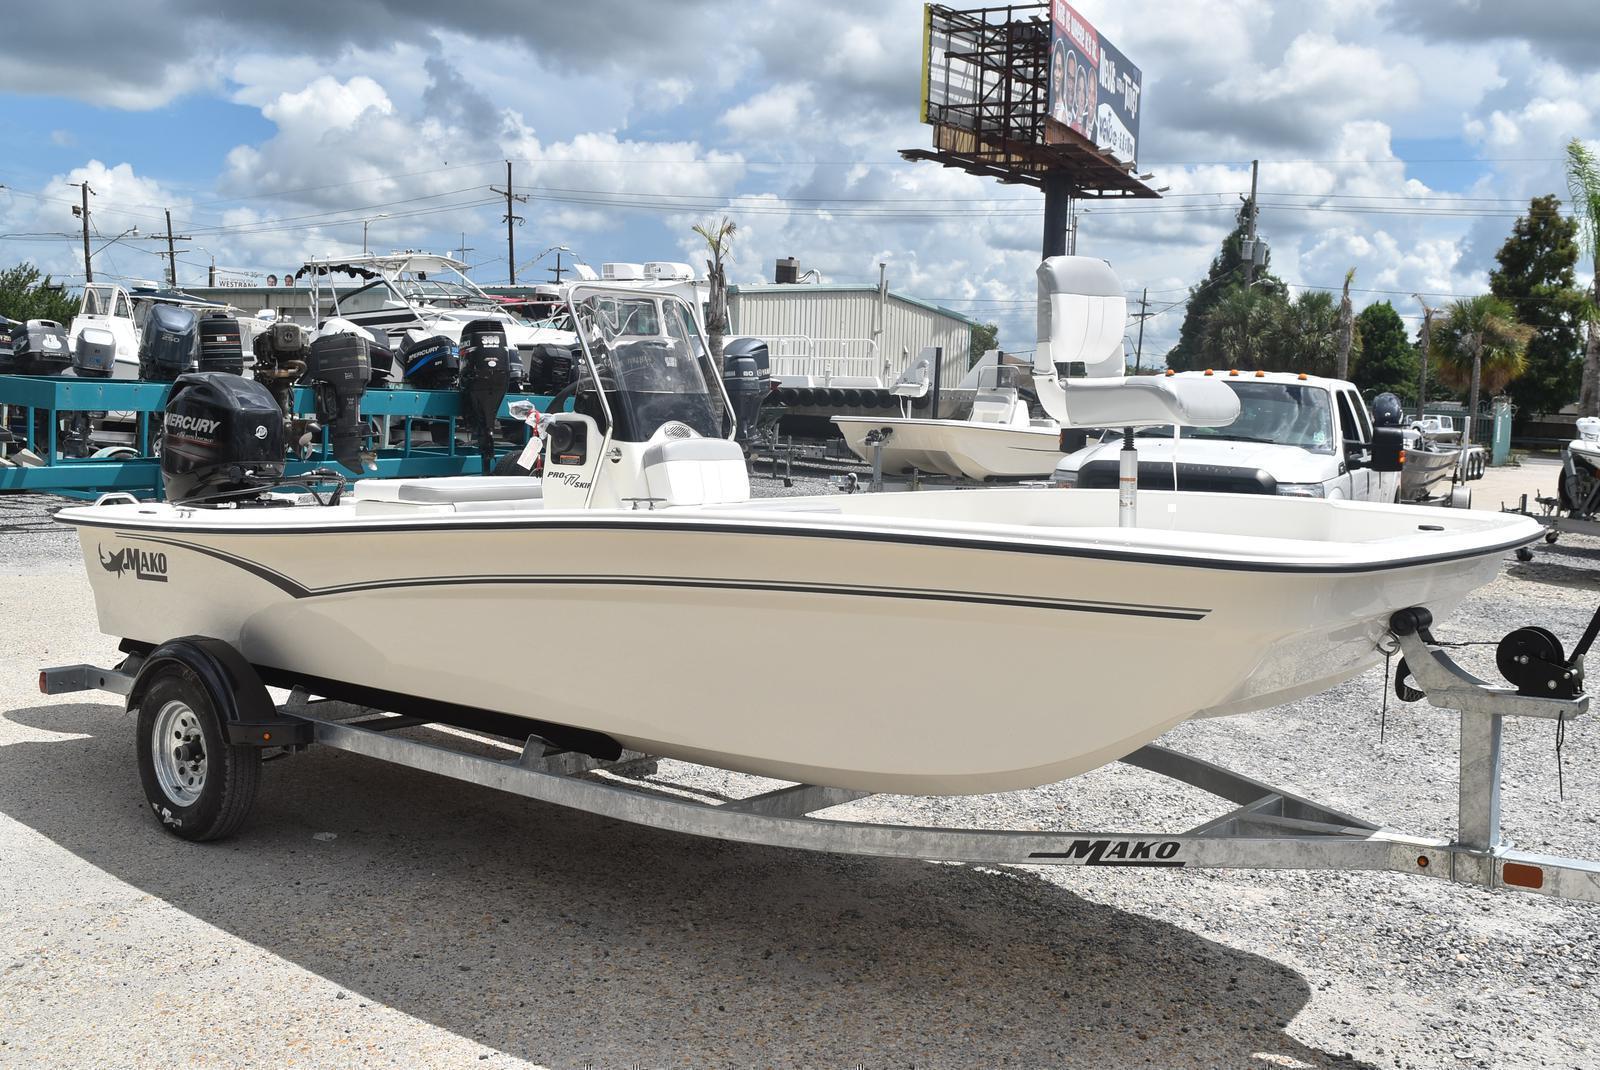 2020 Mako boat for sale, model of the boat is Pro Skiff 17, 75 ELPT & Image # 9 of 9